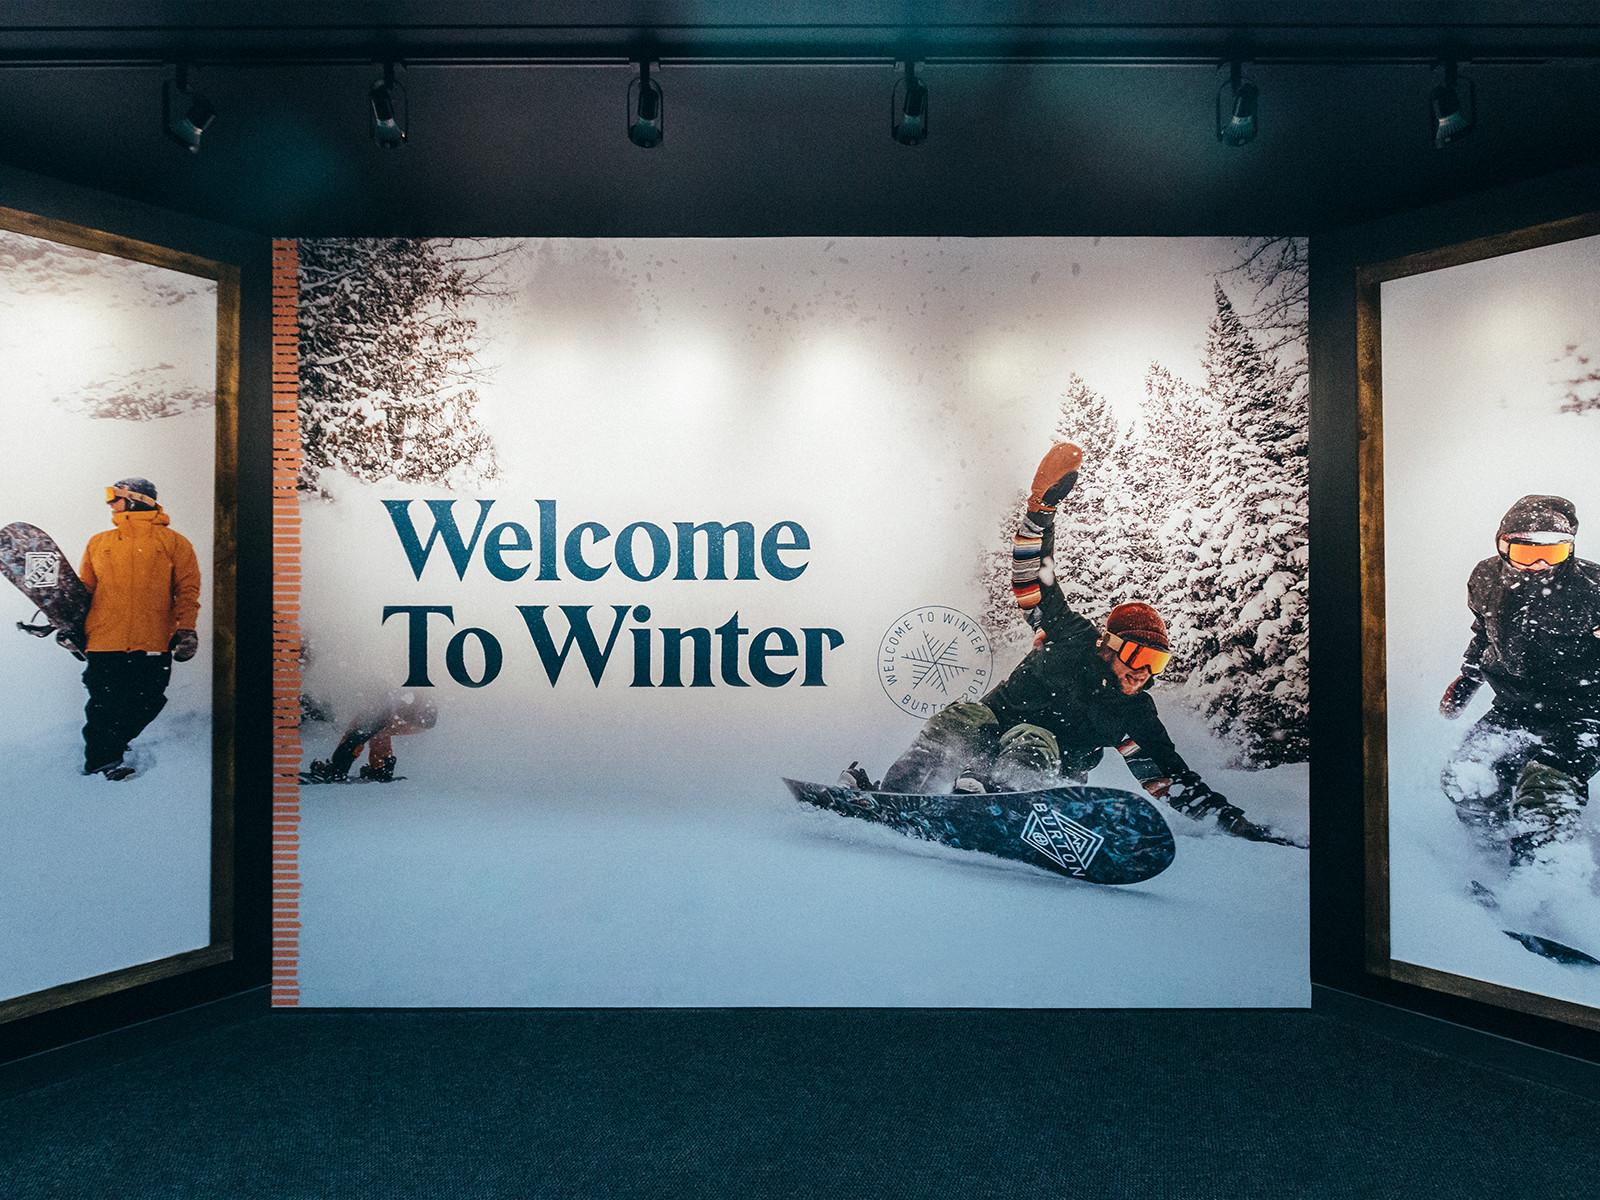 burton-welcome-to-winter-1600.jpg